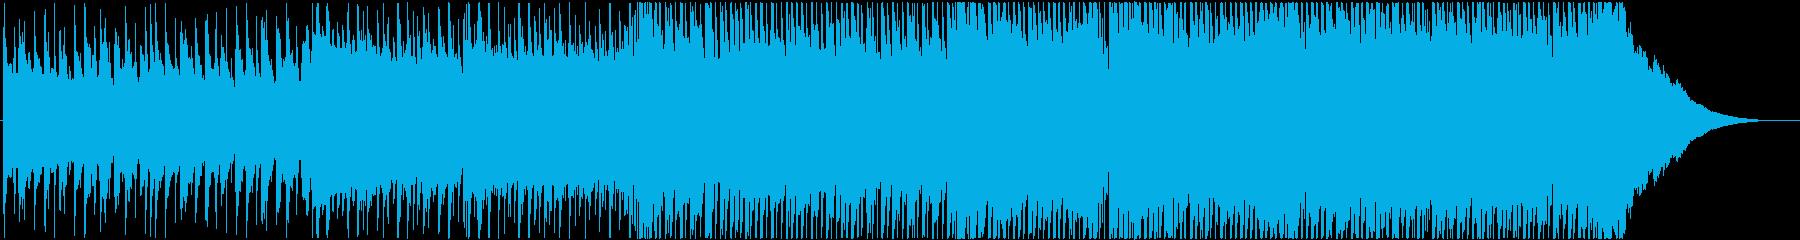 Refreshing J-POP sound ♪'s reproduced waveform